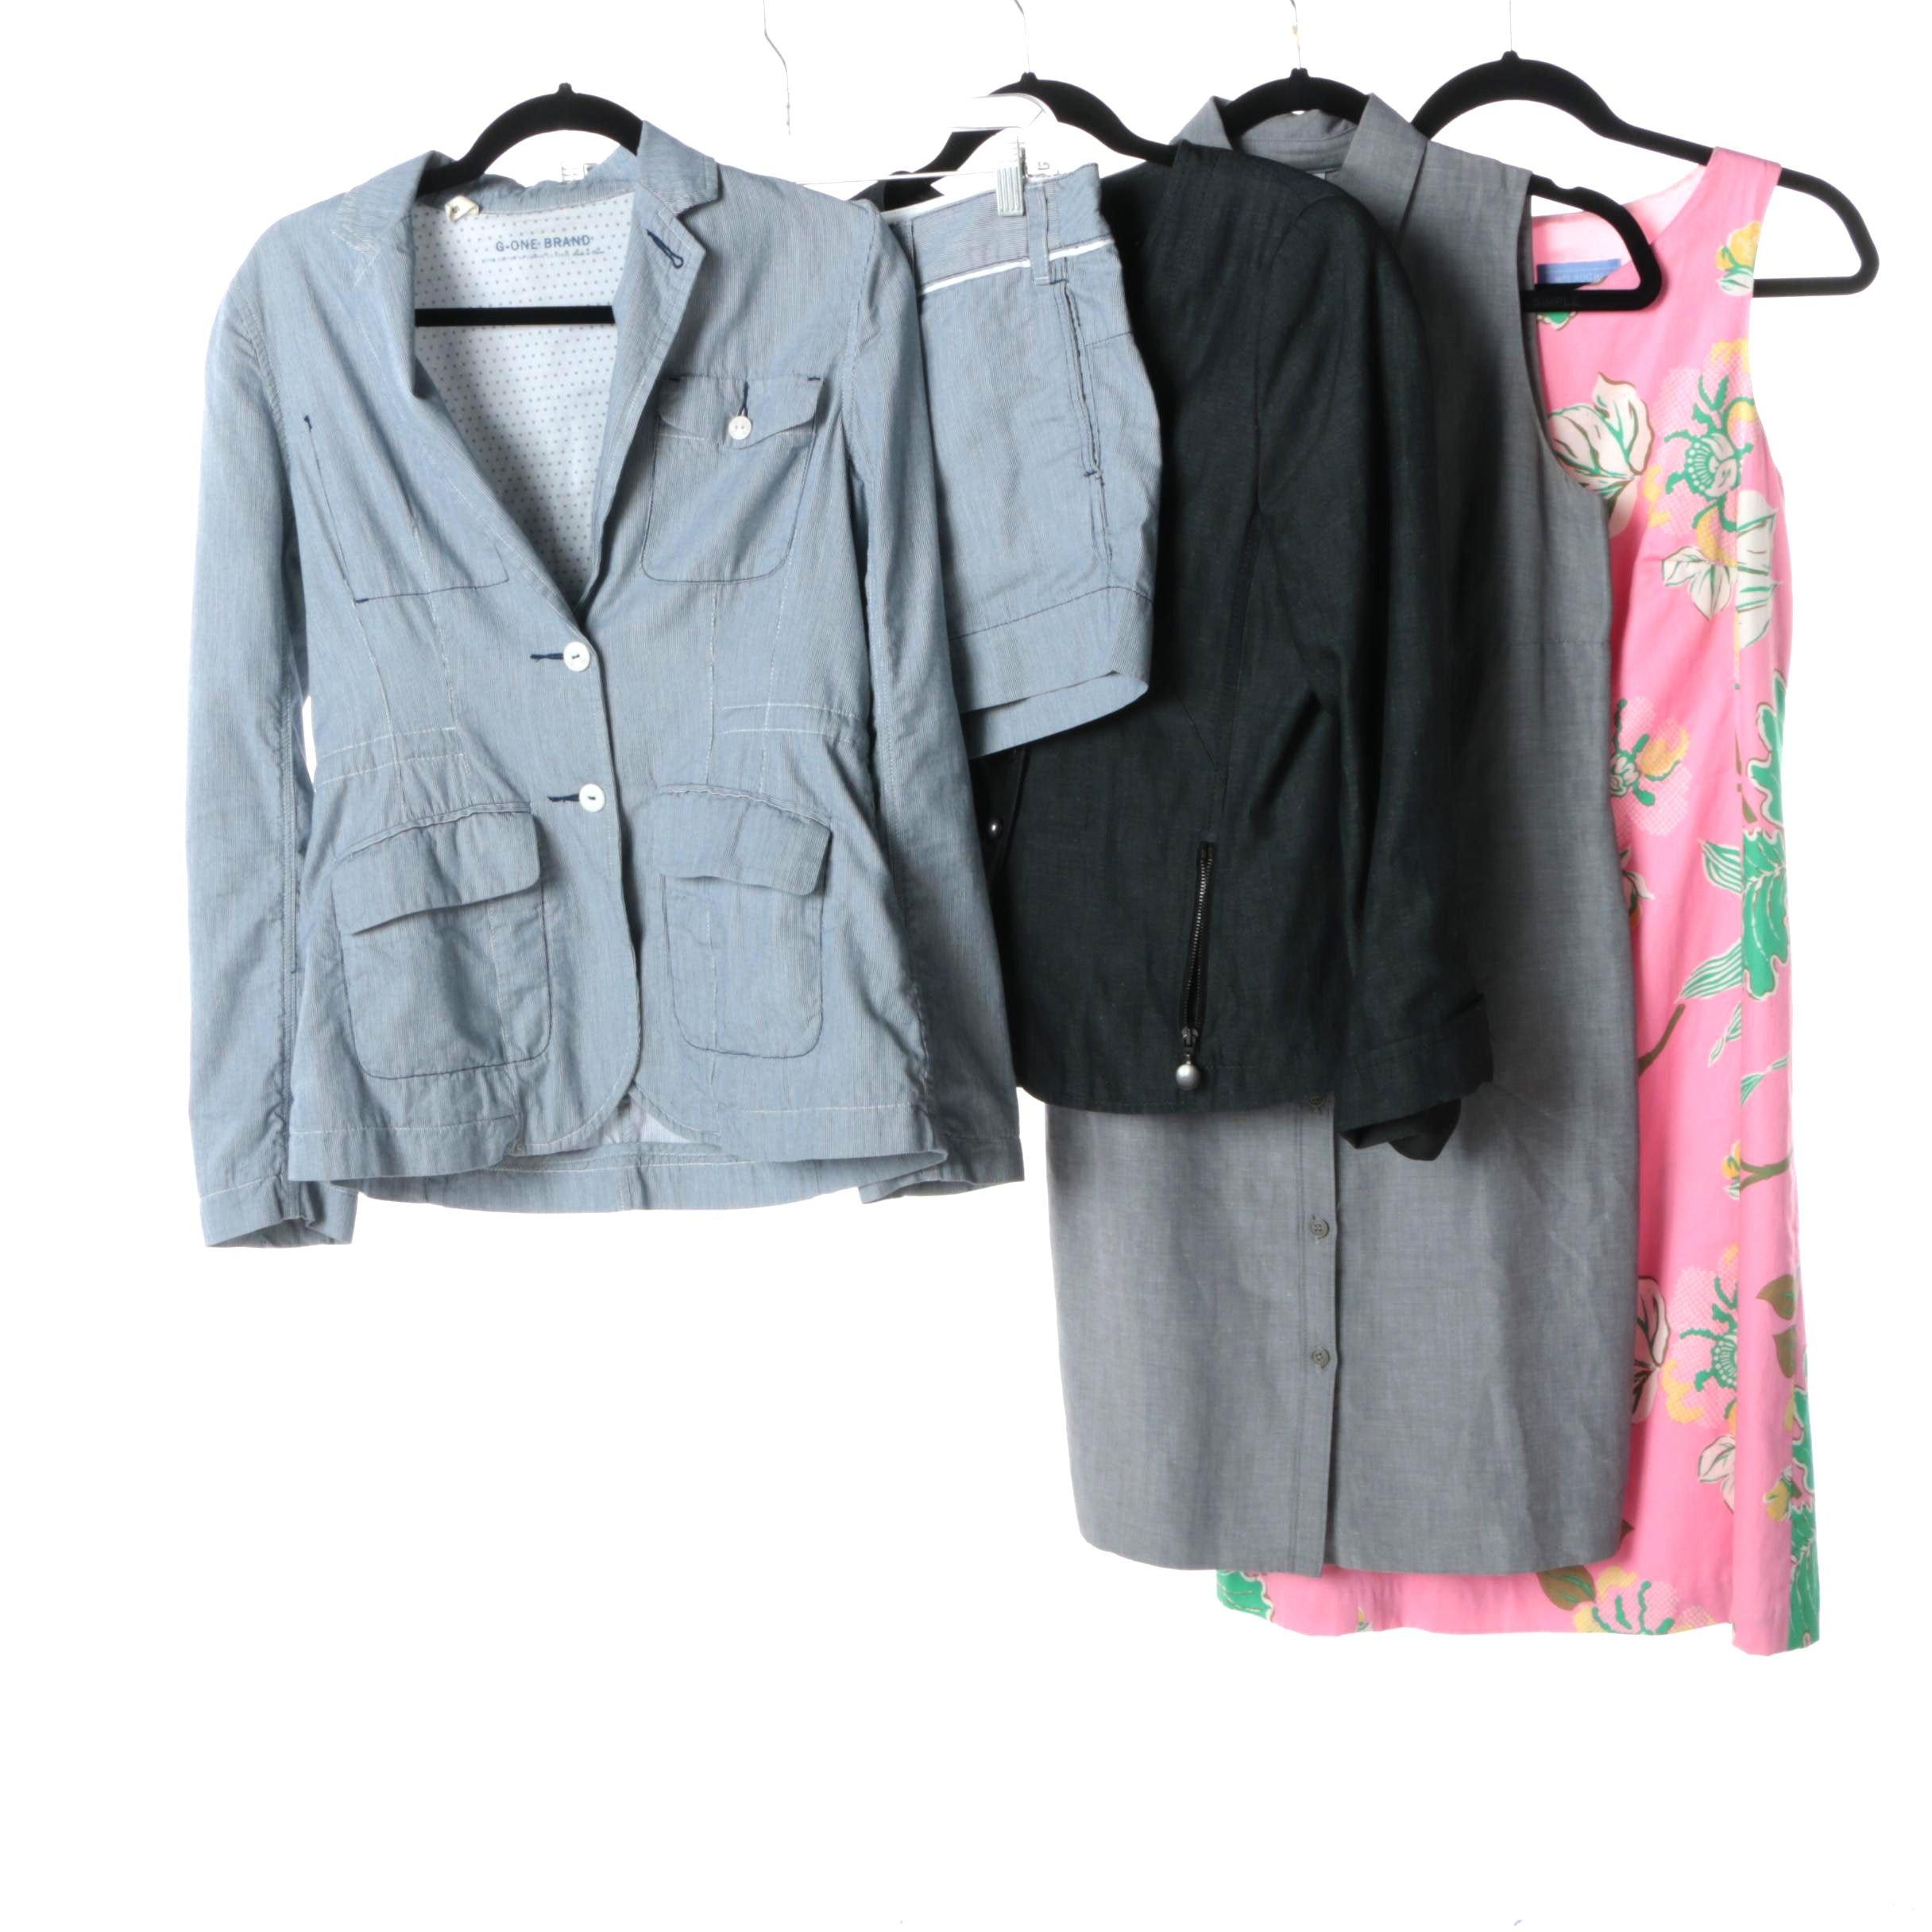 Women's Casual Short Suit, Blazer and Dresses